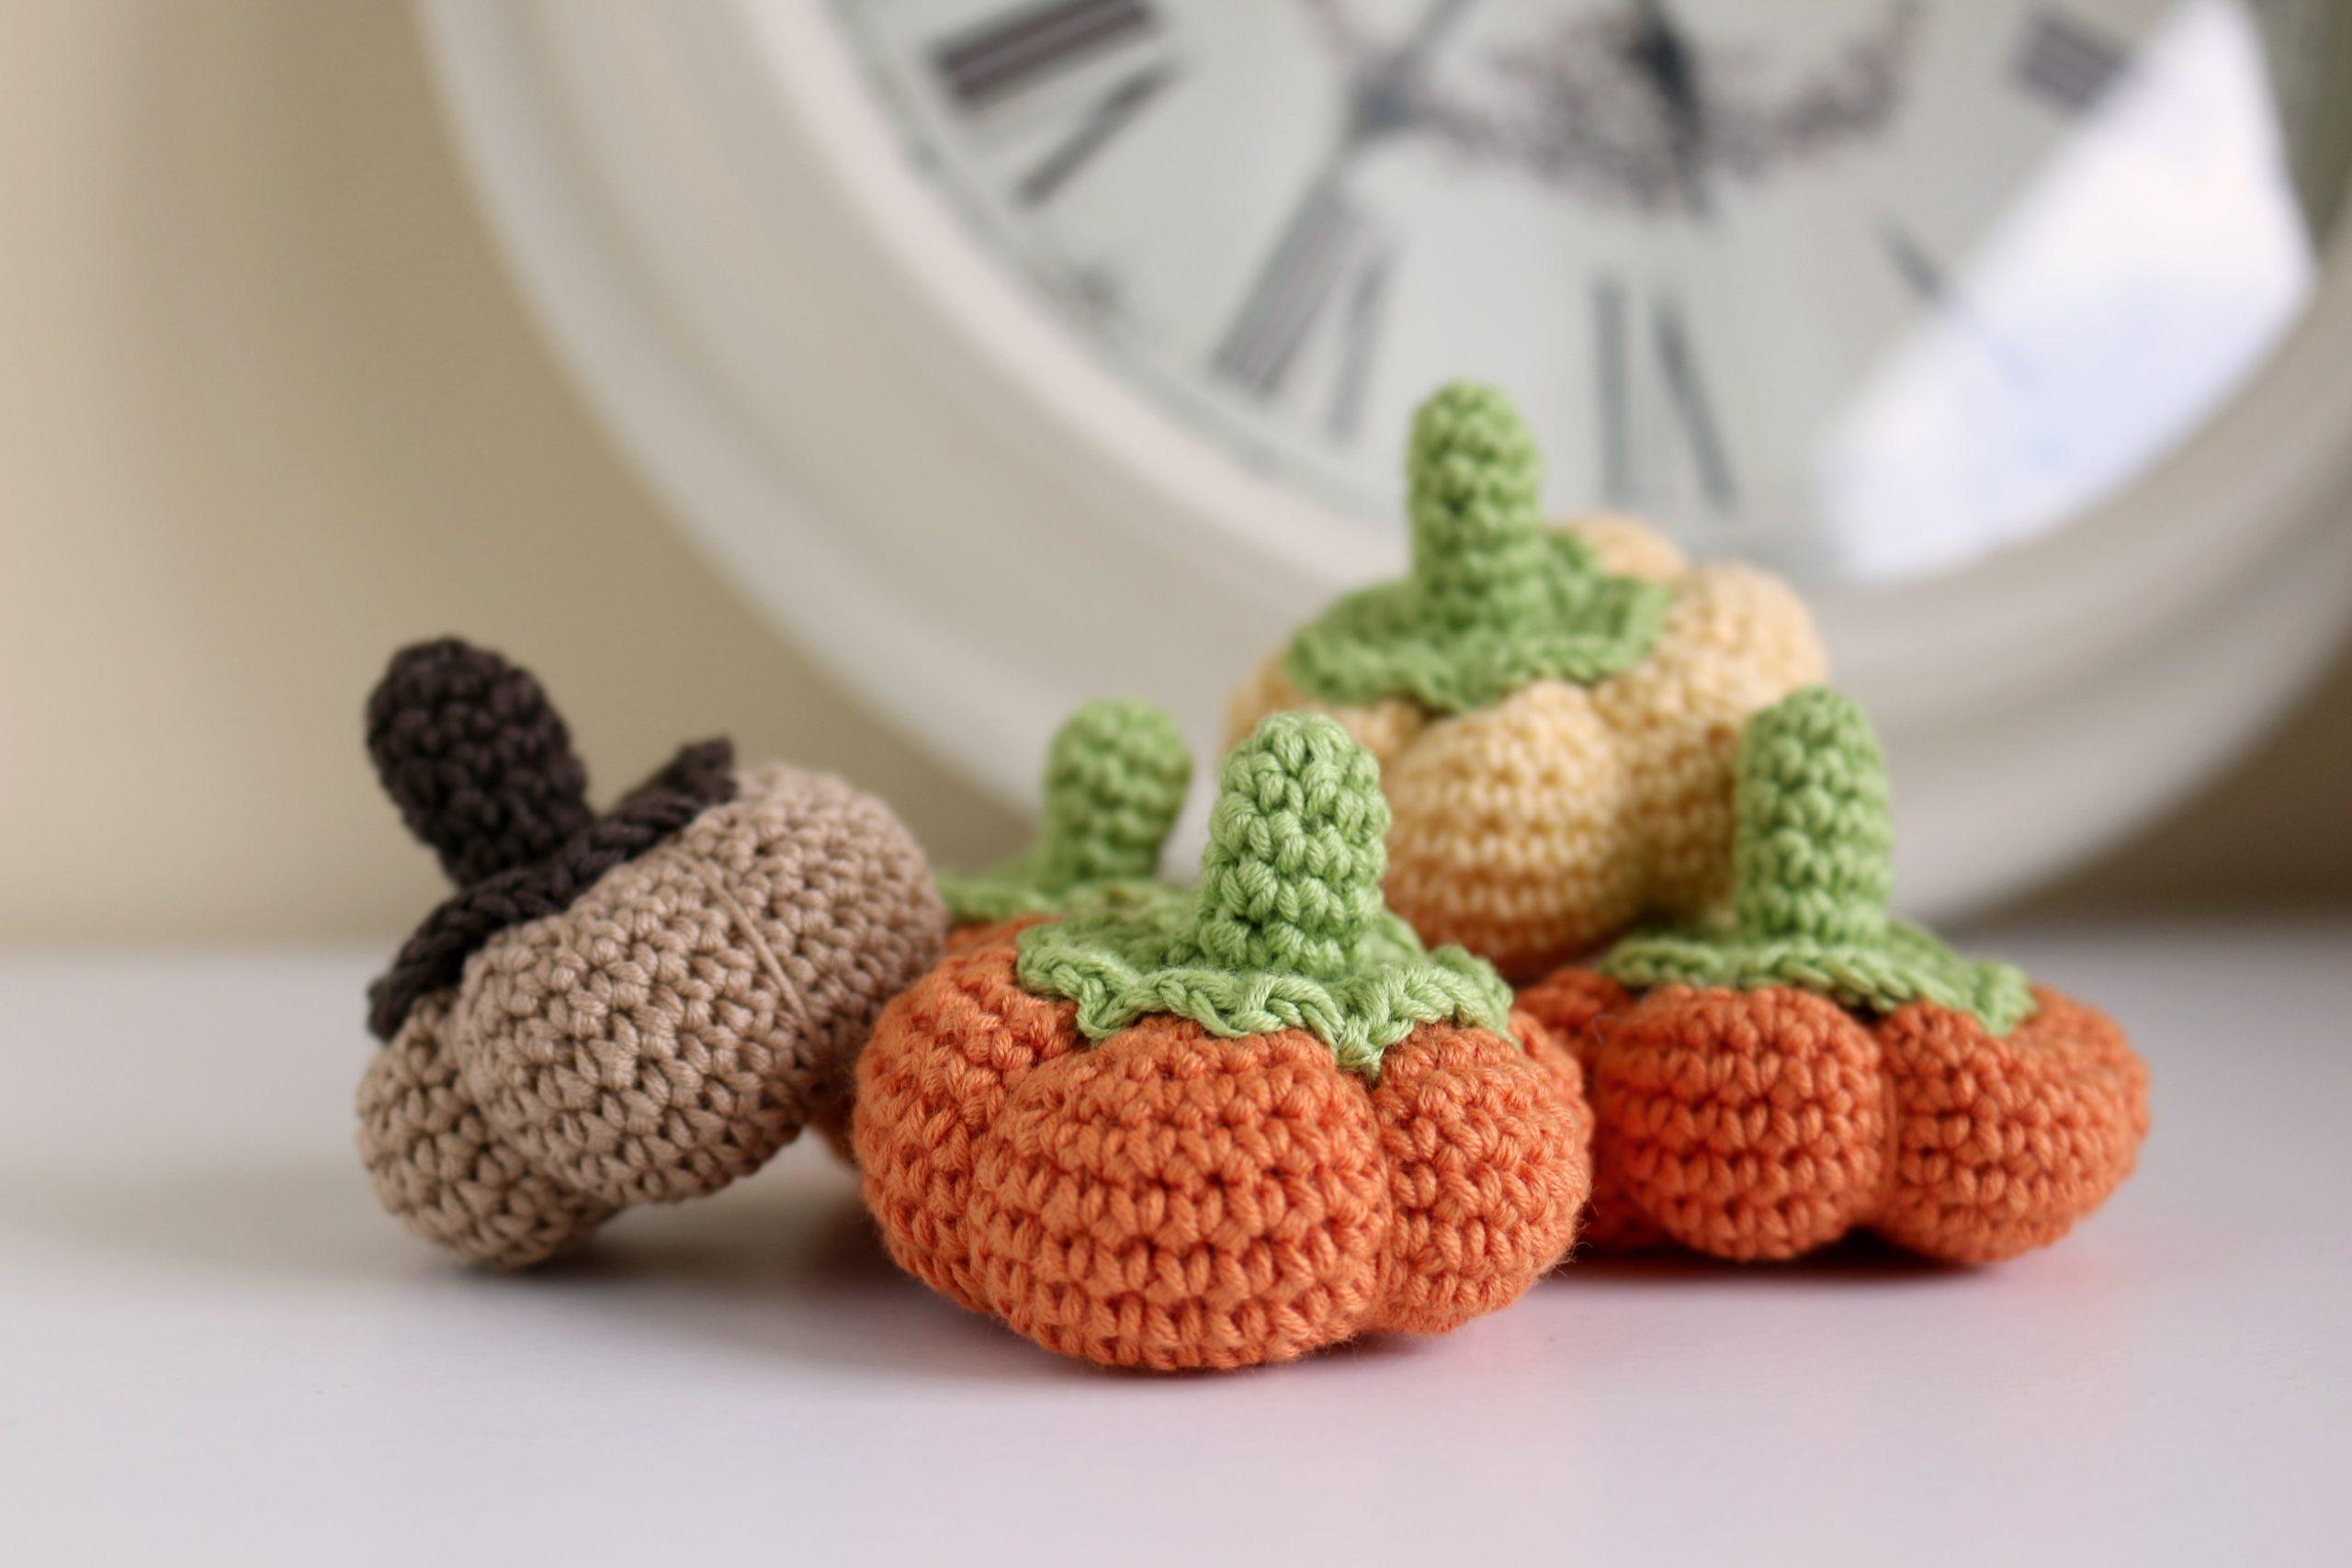 pumkin amigurumi crochet free pattern with video tutorial step by step